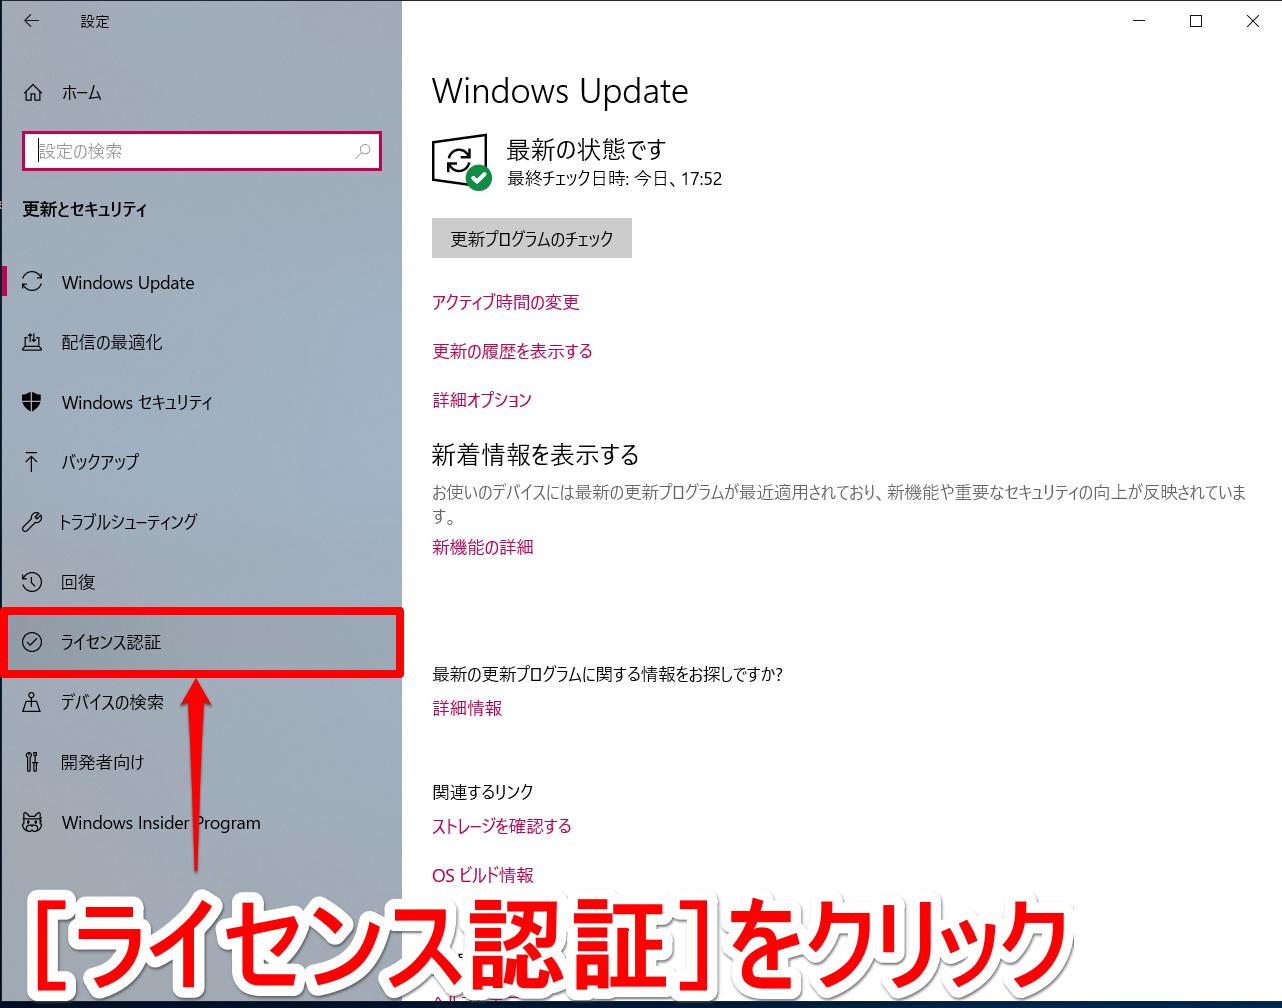 「Windows Update」画面(ウィンドウズアップデート画面)